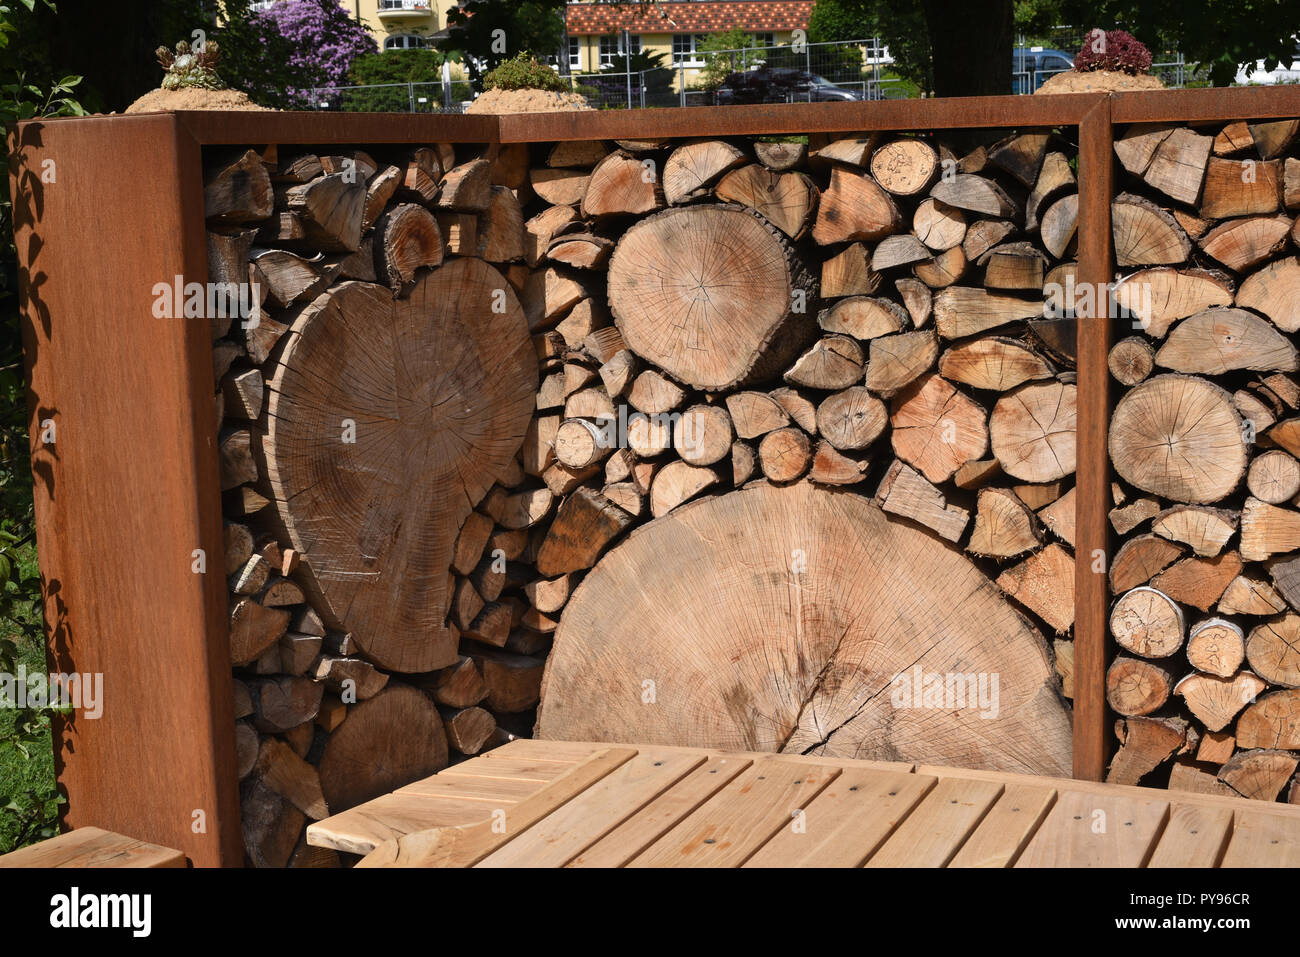 Holzwand Sichtschutz Stock Photo Alamy